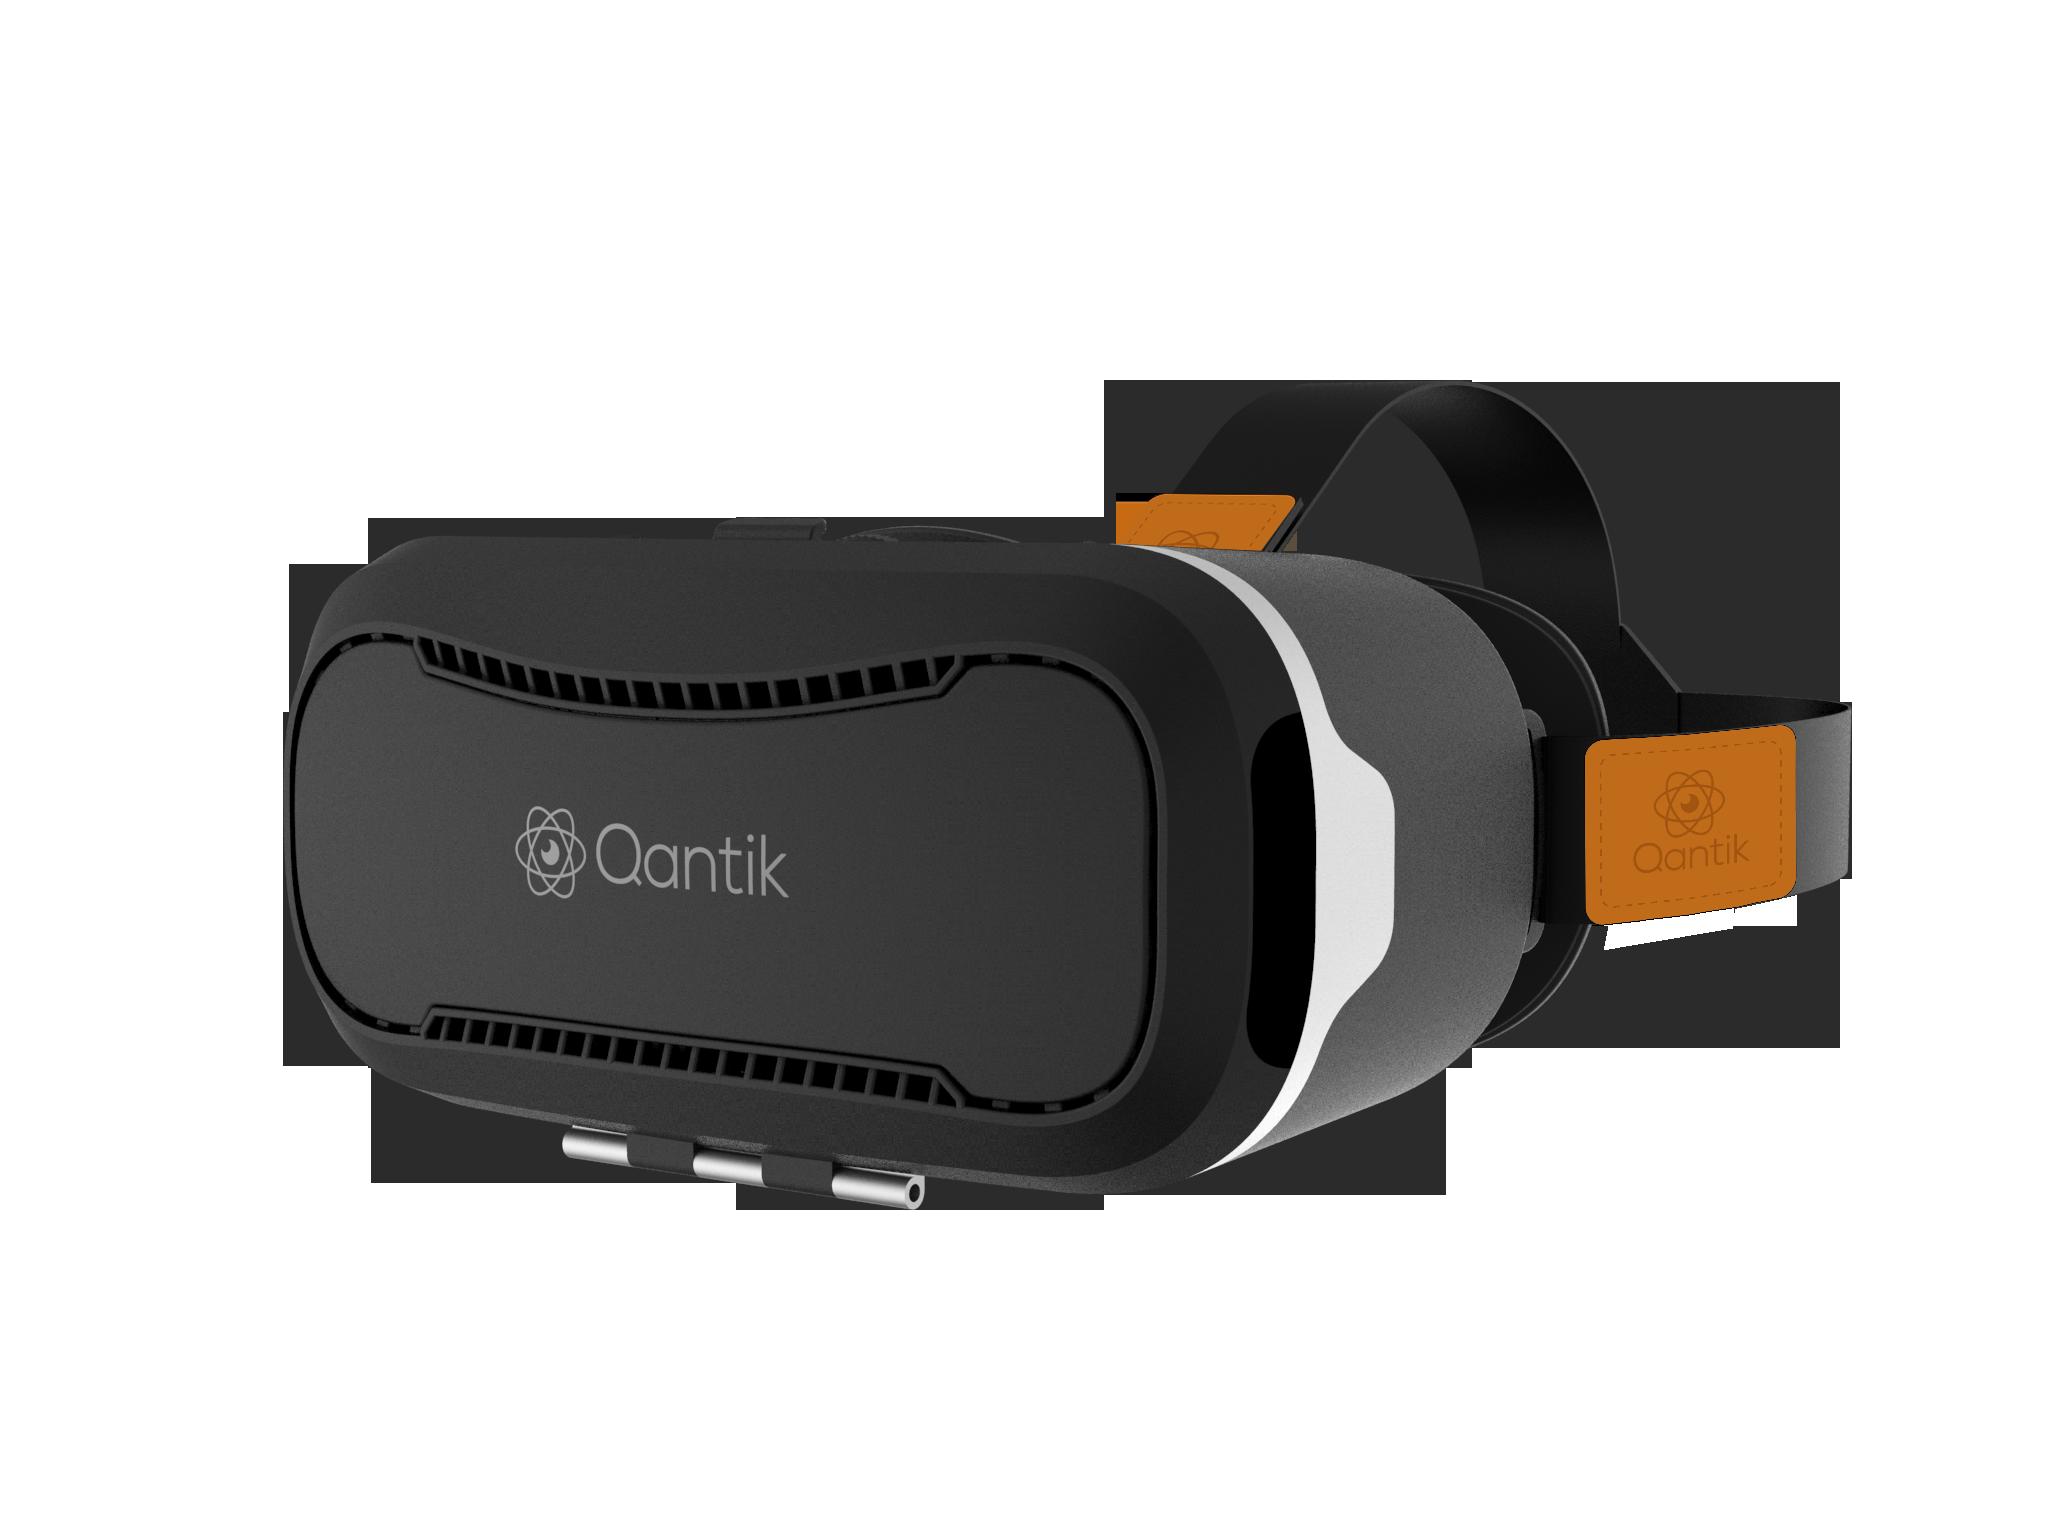 Casque de réalité virtuelle - COSMO² - noir Qantik - COSMO²